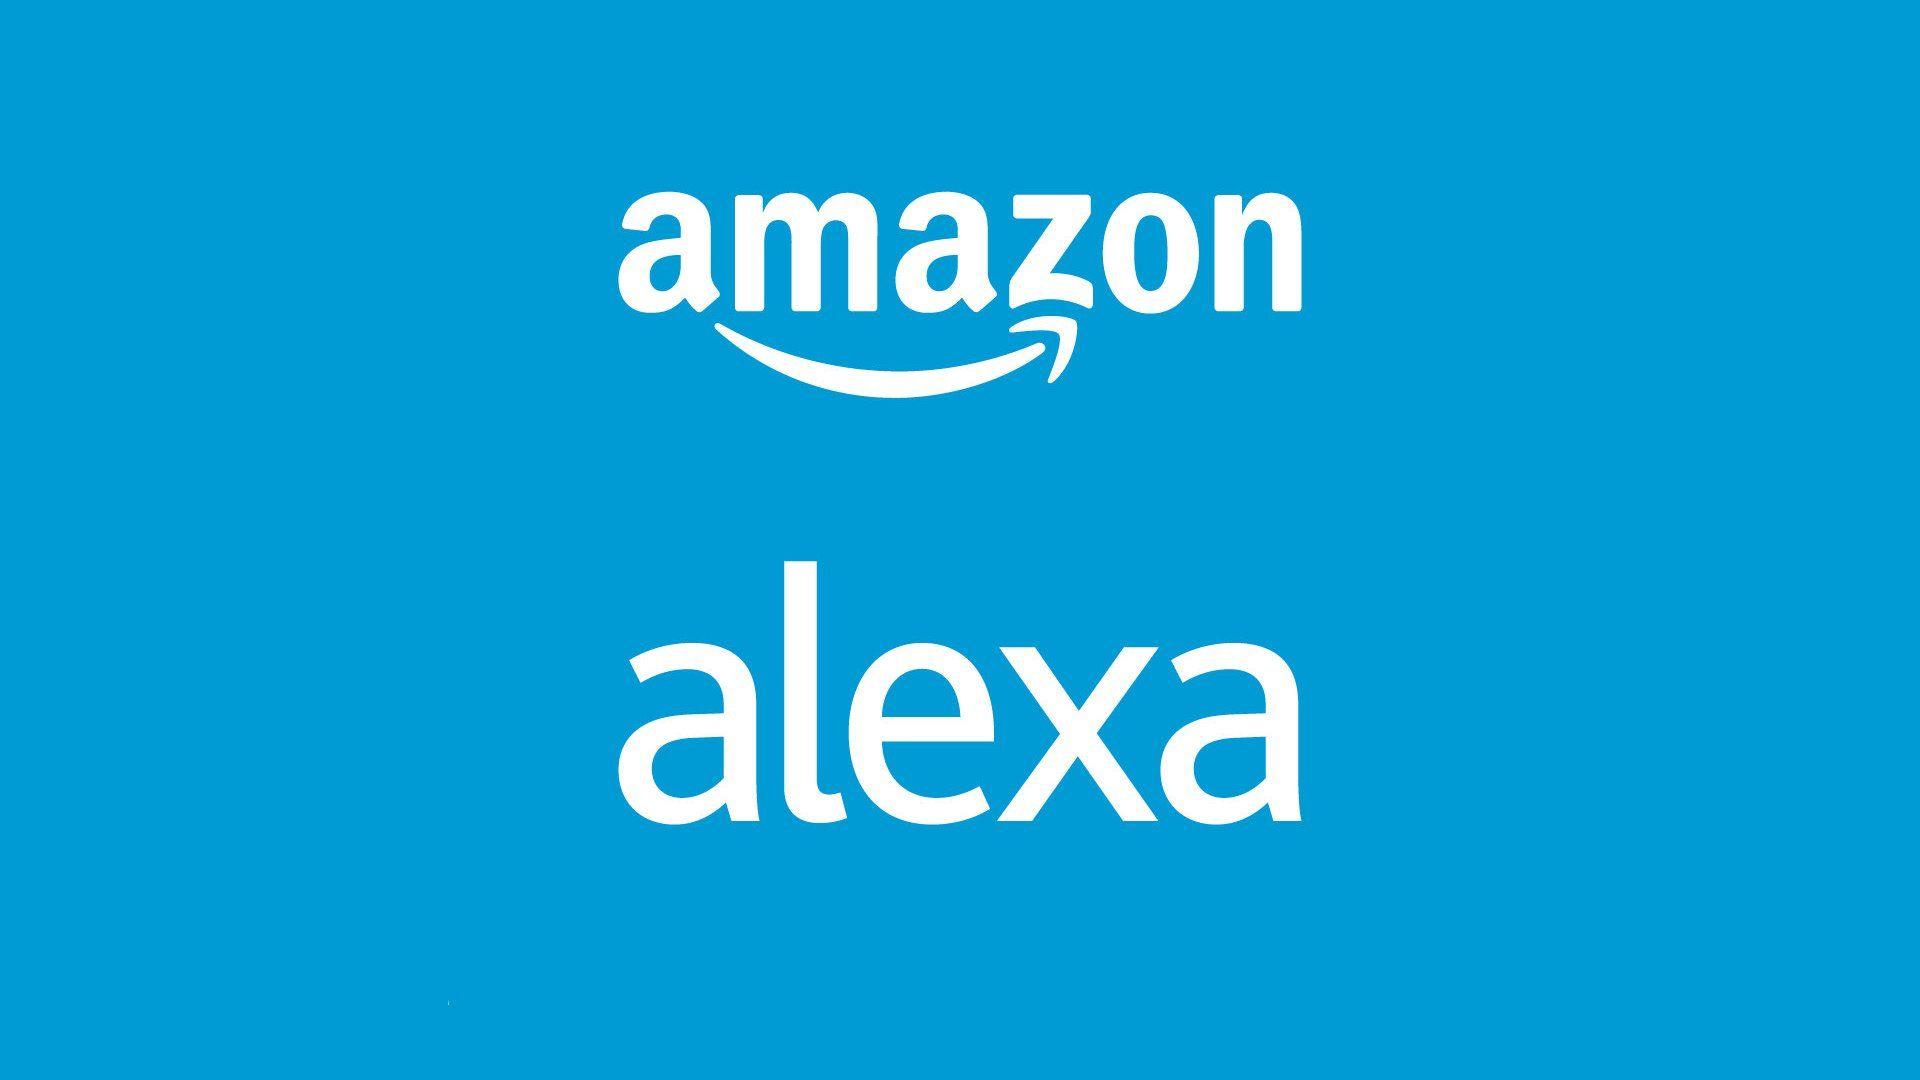 Amazon Alexa Coming To Apple iPhone - Prime Inspiration